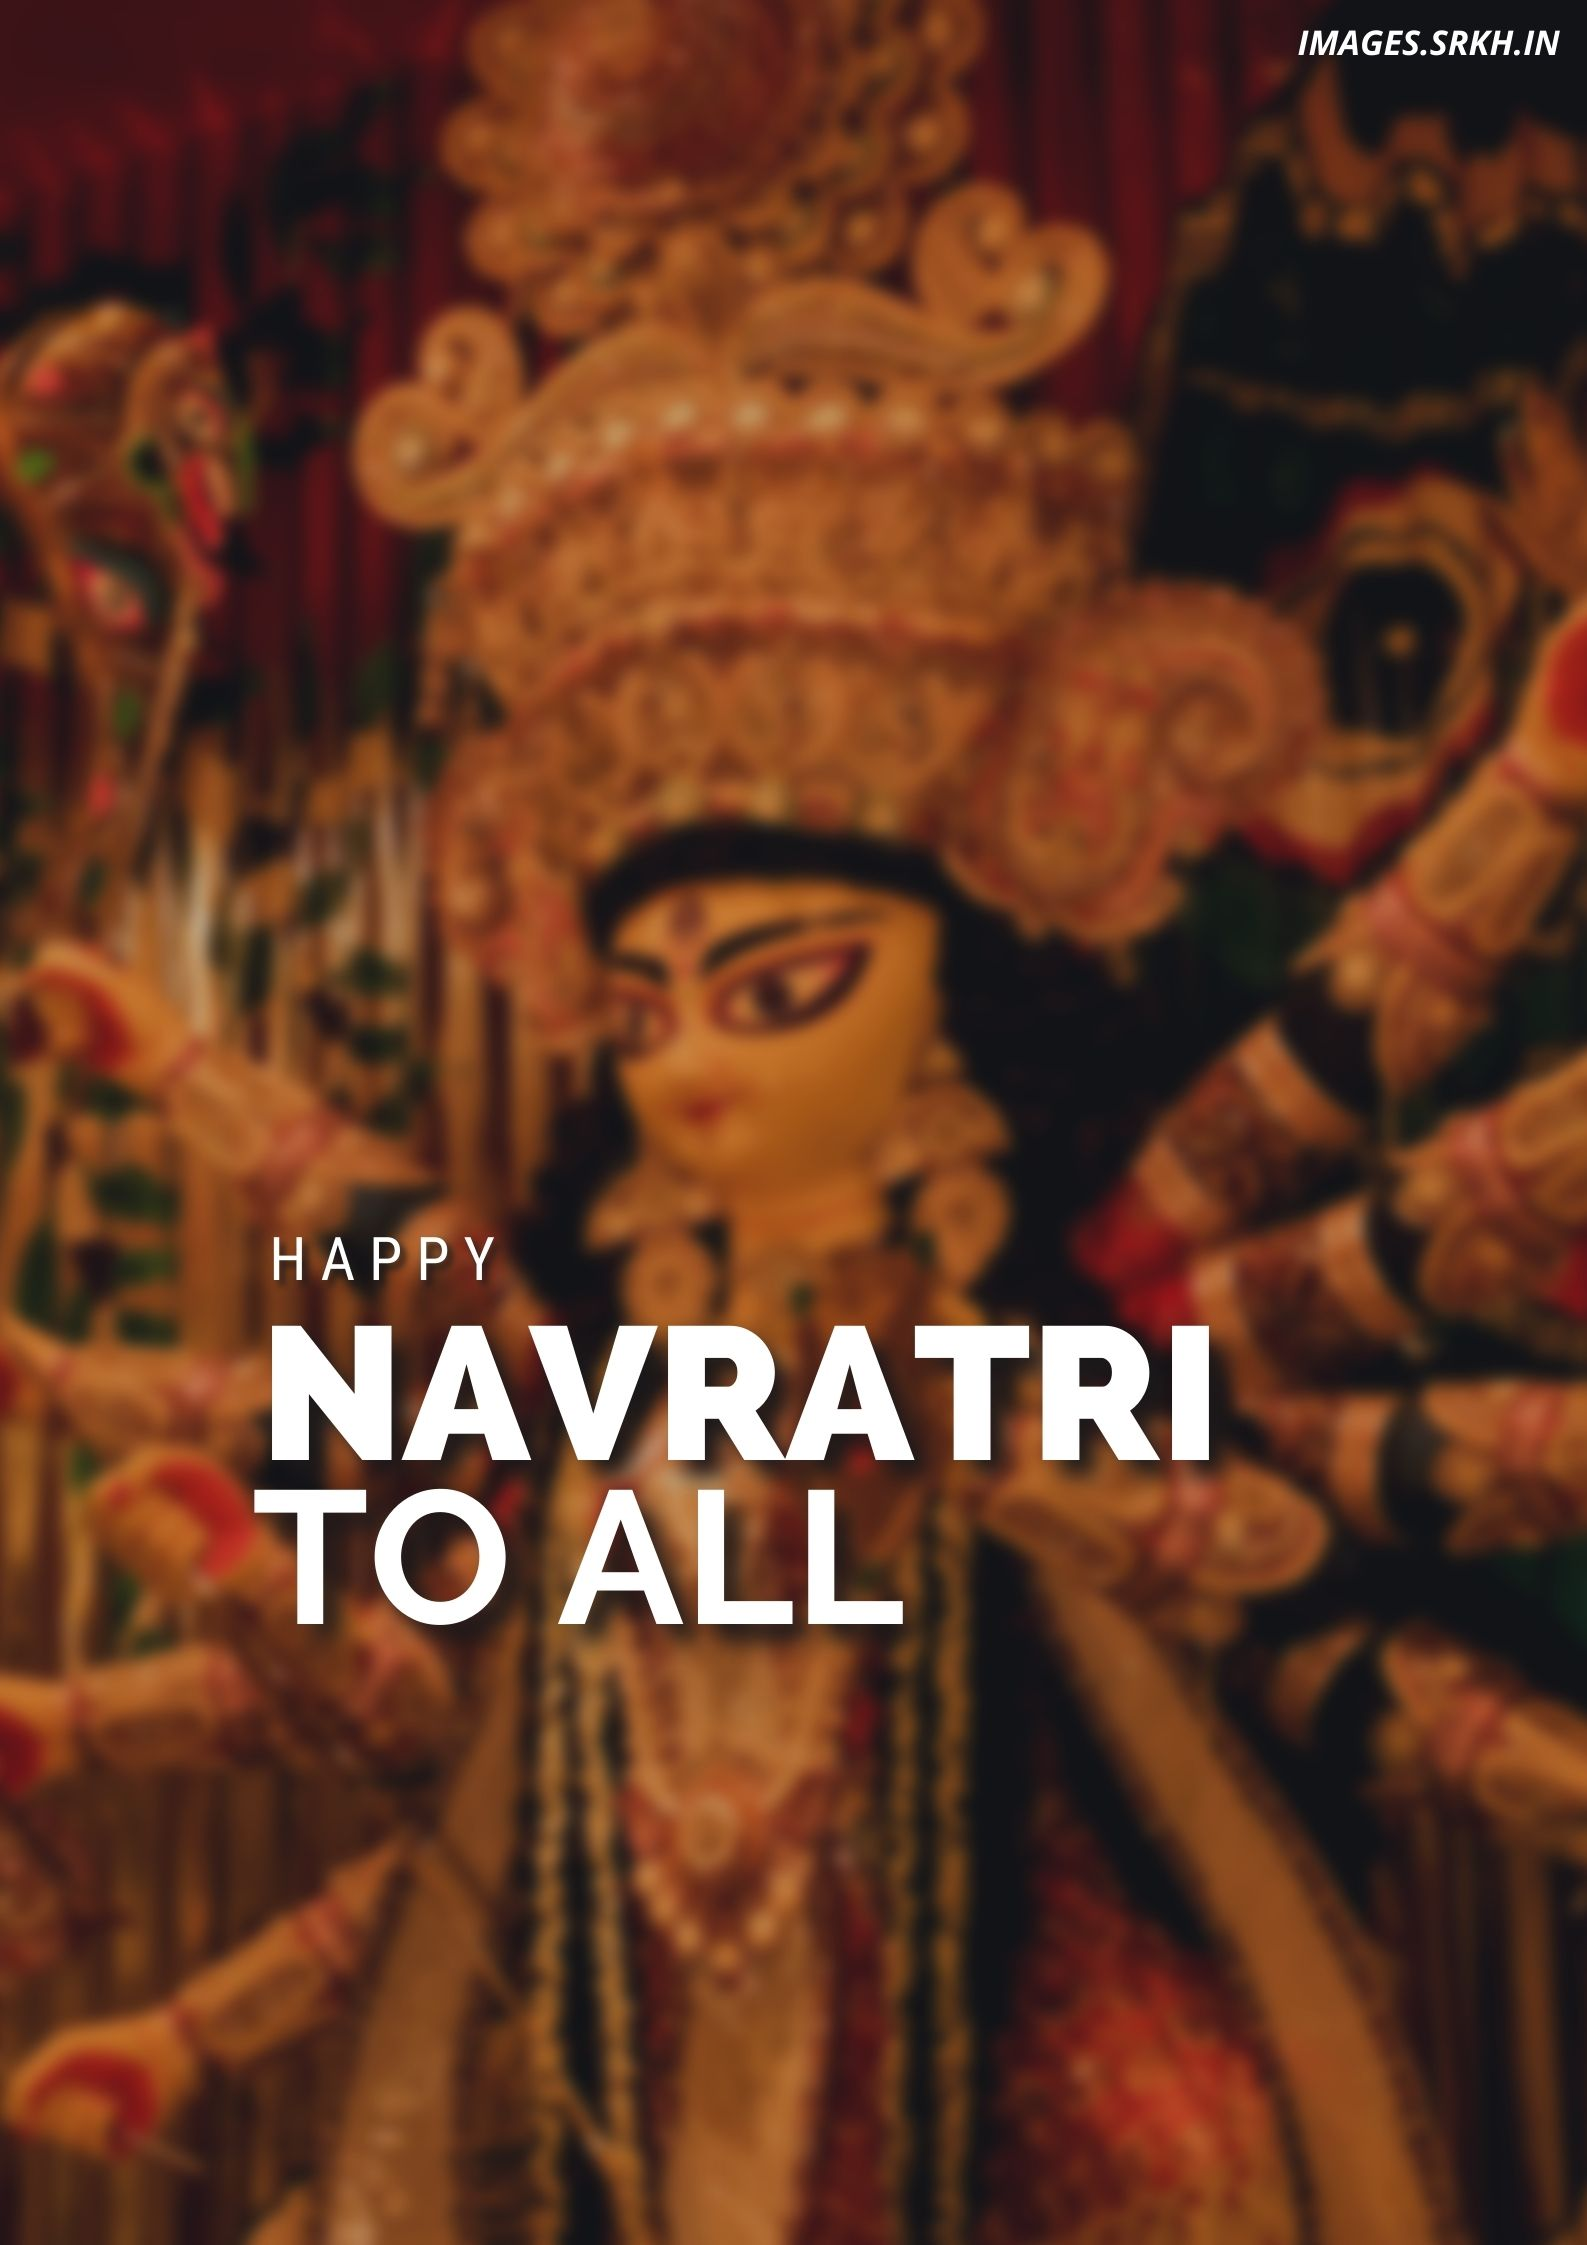 Navratri Poster full HD free download.